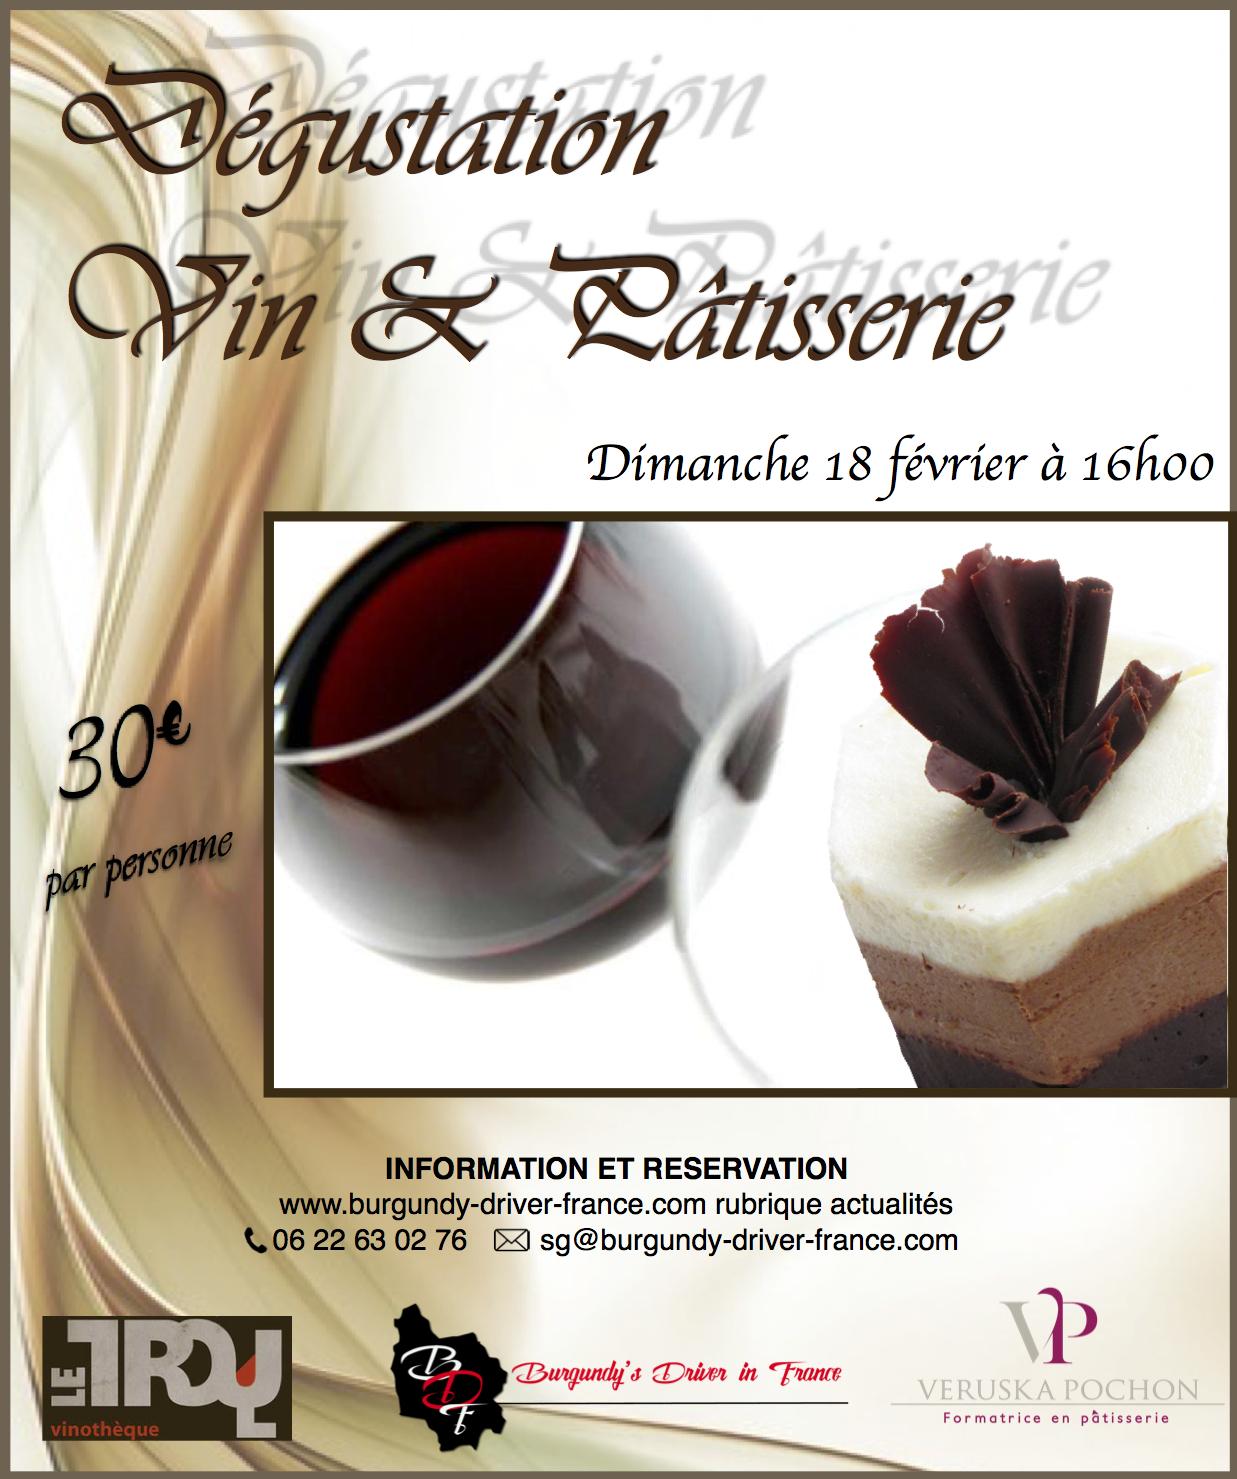 degustation vin patisserie 18 février